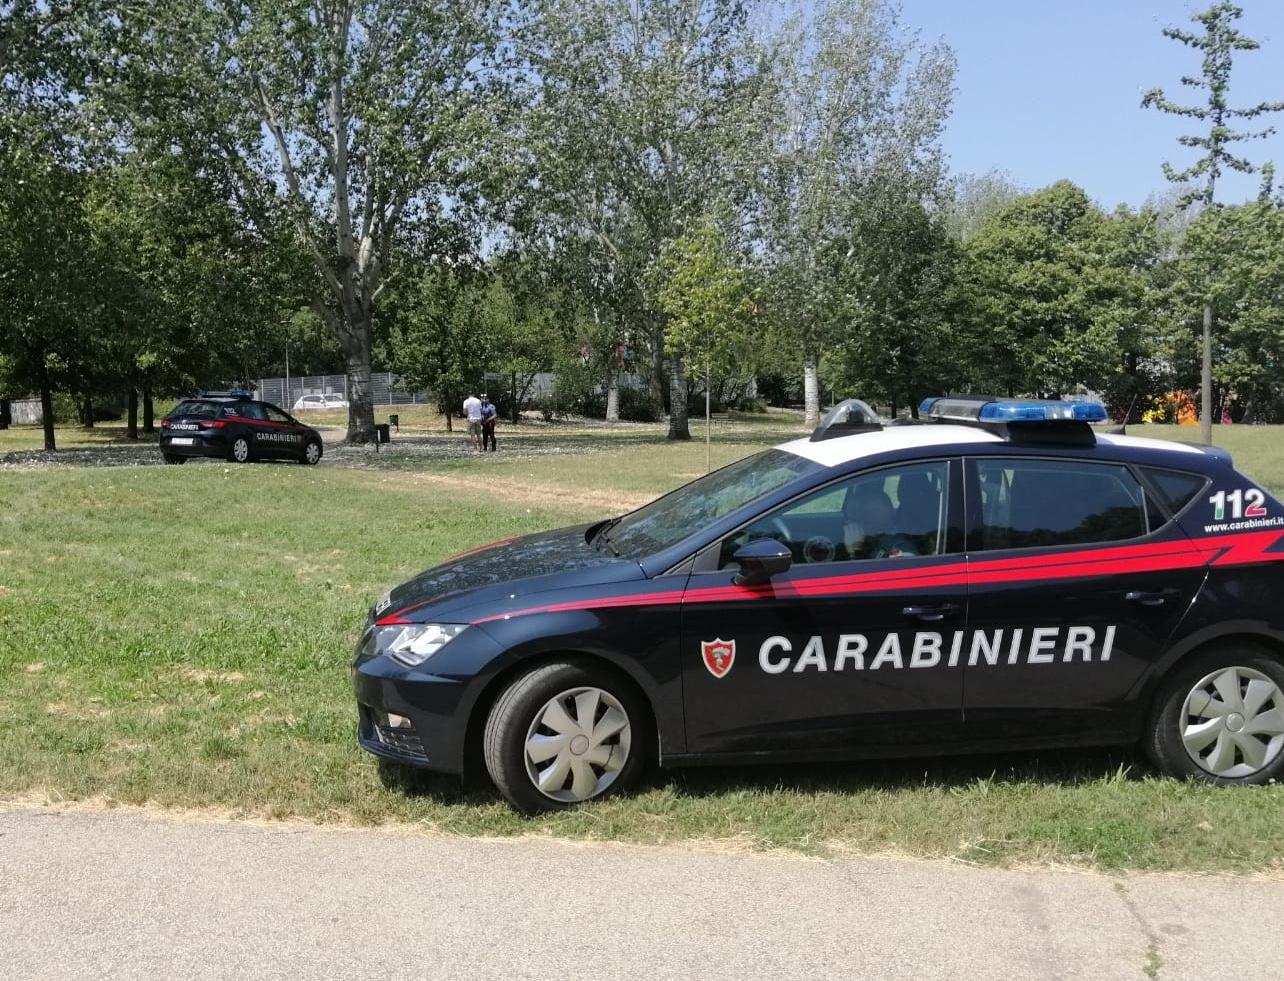 Automobilisti ubriachi: a Camugnano e Castel Guelfo due persone denunciate dai Carabinieri